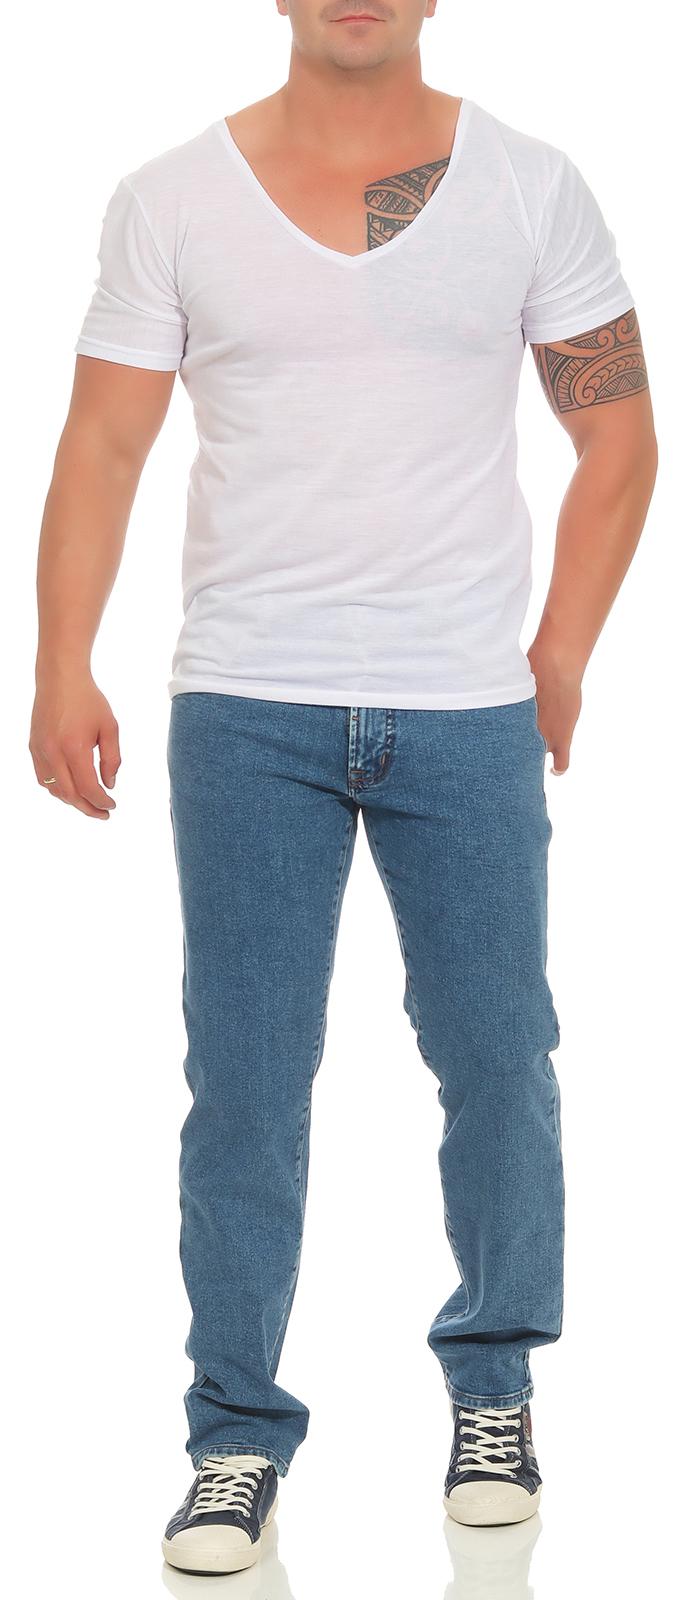 PIERRE-CARDIN-Herren-Jeans-Dijon-Hose-Comfort-Stretch-Freizeitjeans-Modern-NEU-3 Indexbild 9